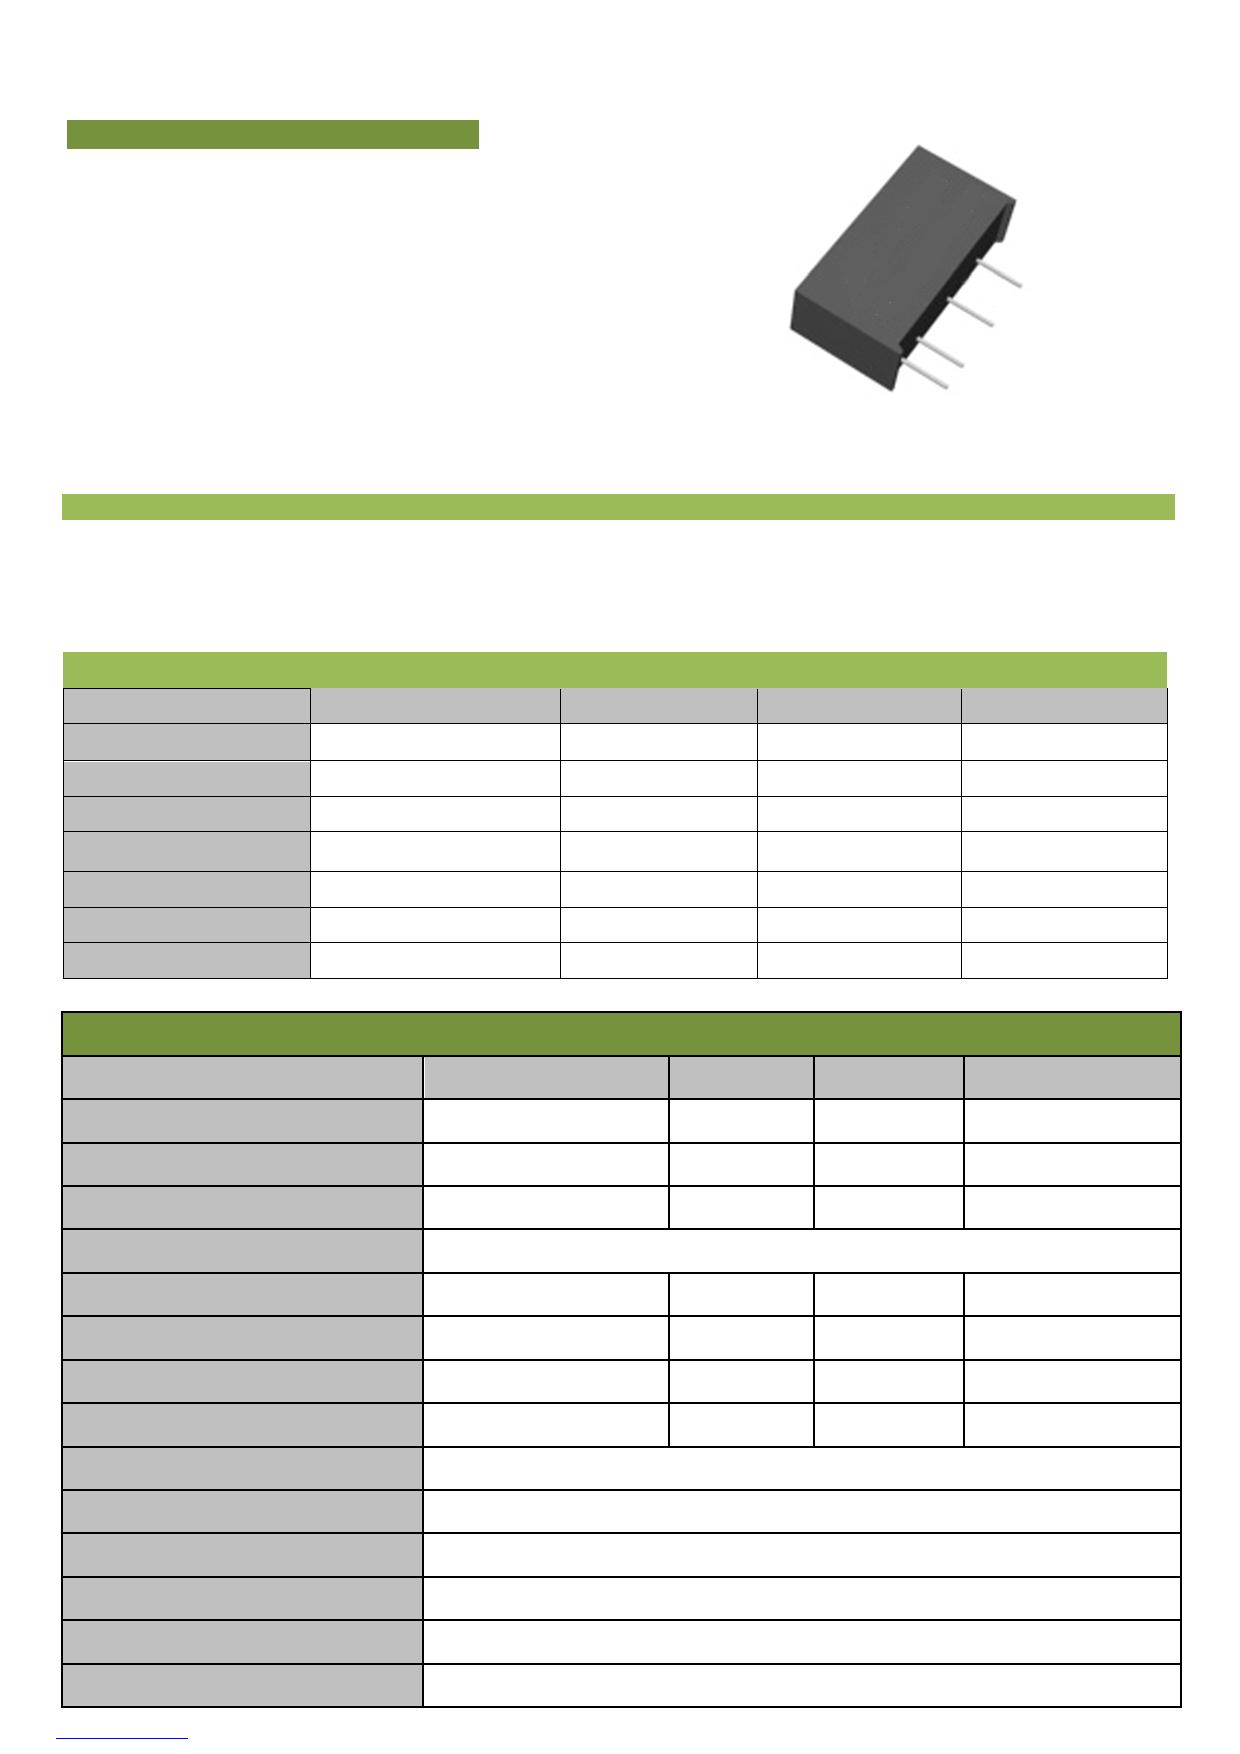 B0505LS-1W datasheet